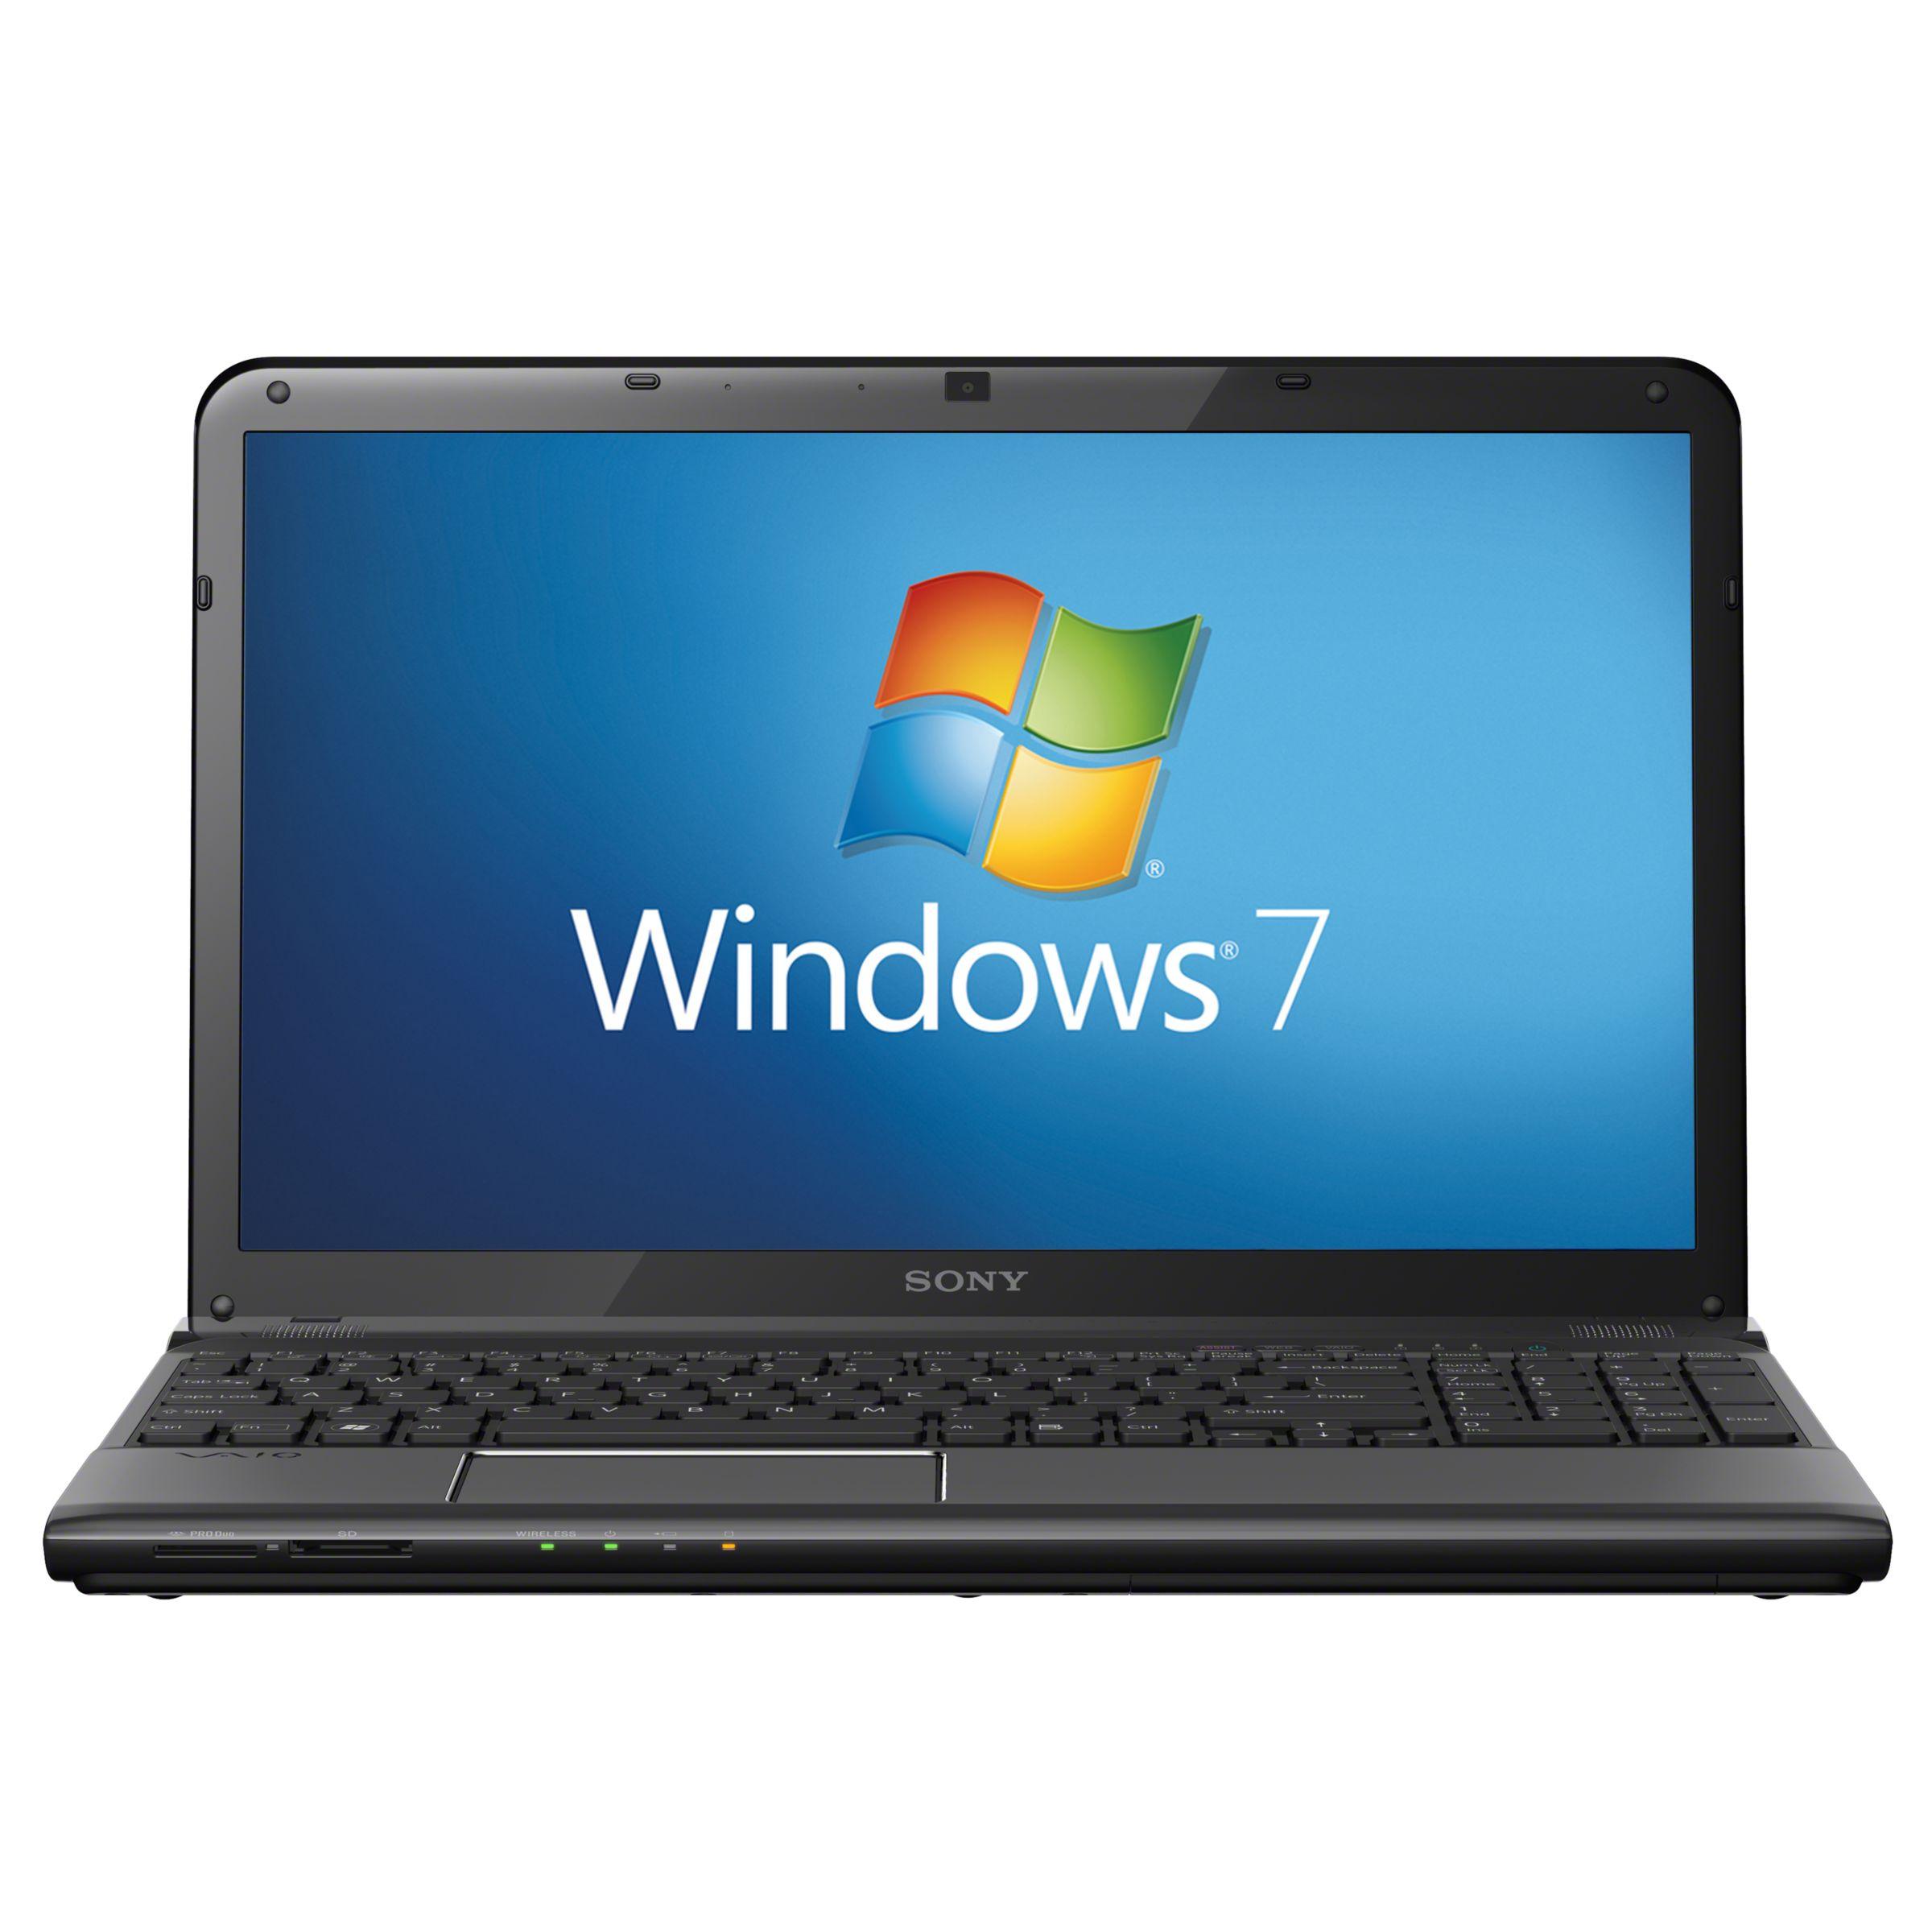 "Sony Vaio E1511f1eb Laptop, Intel Core I3, 2.4ghz, 4gb Ram, 640gb, 15.6"", Black"